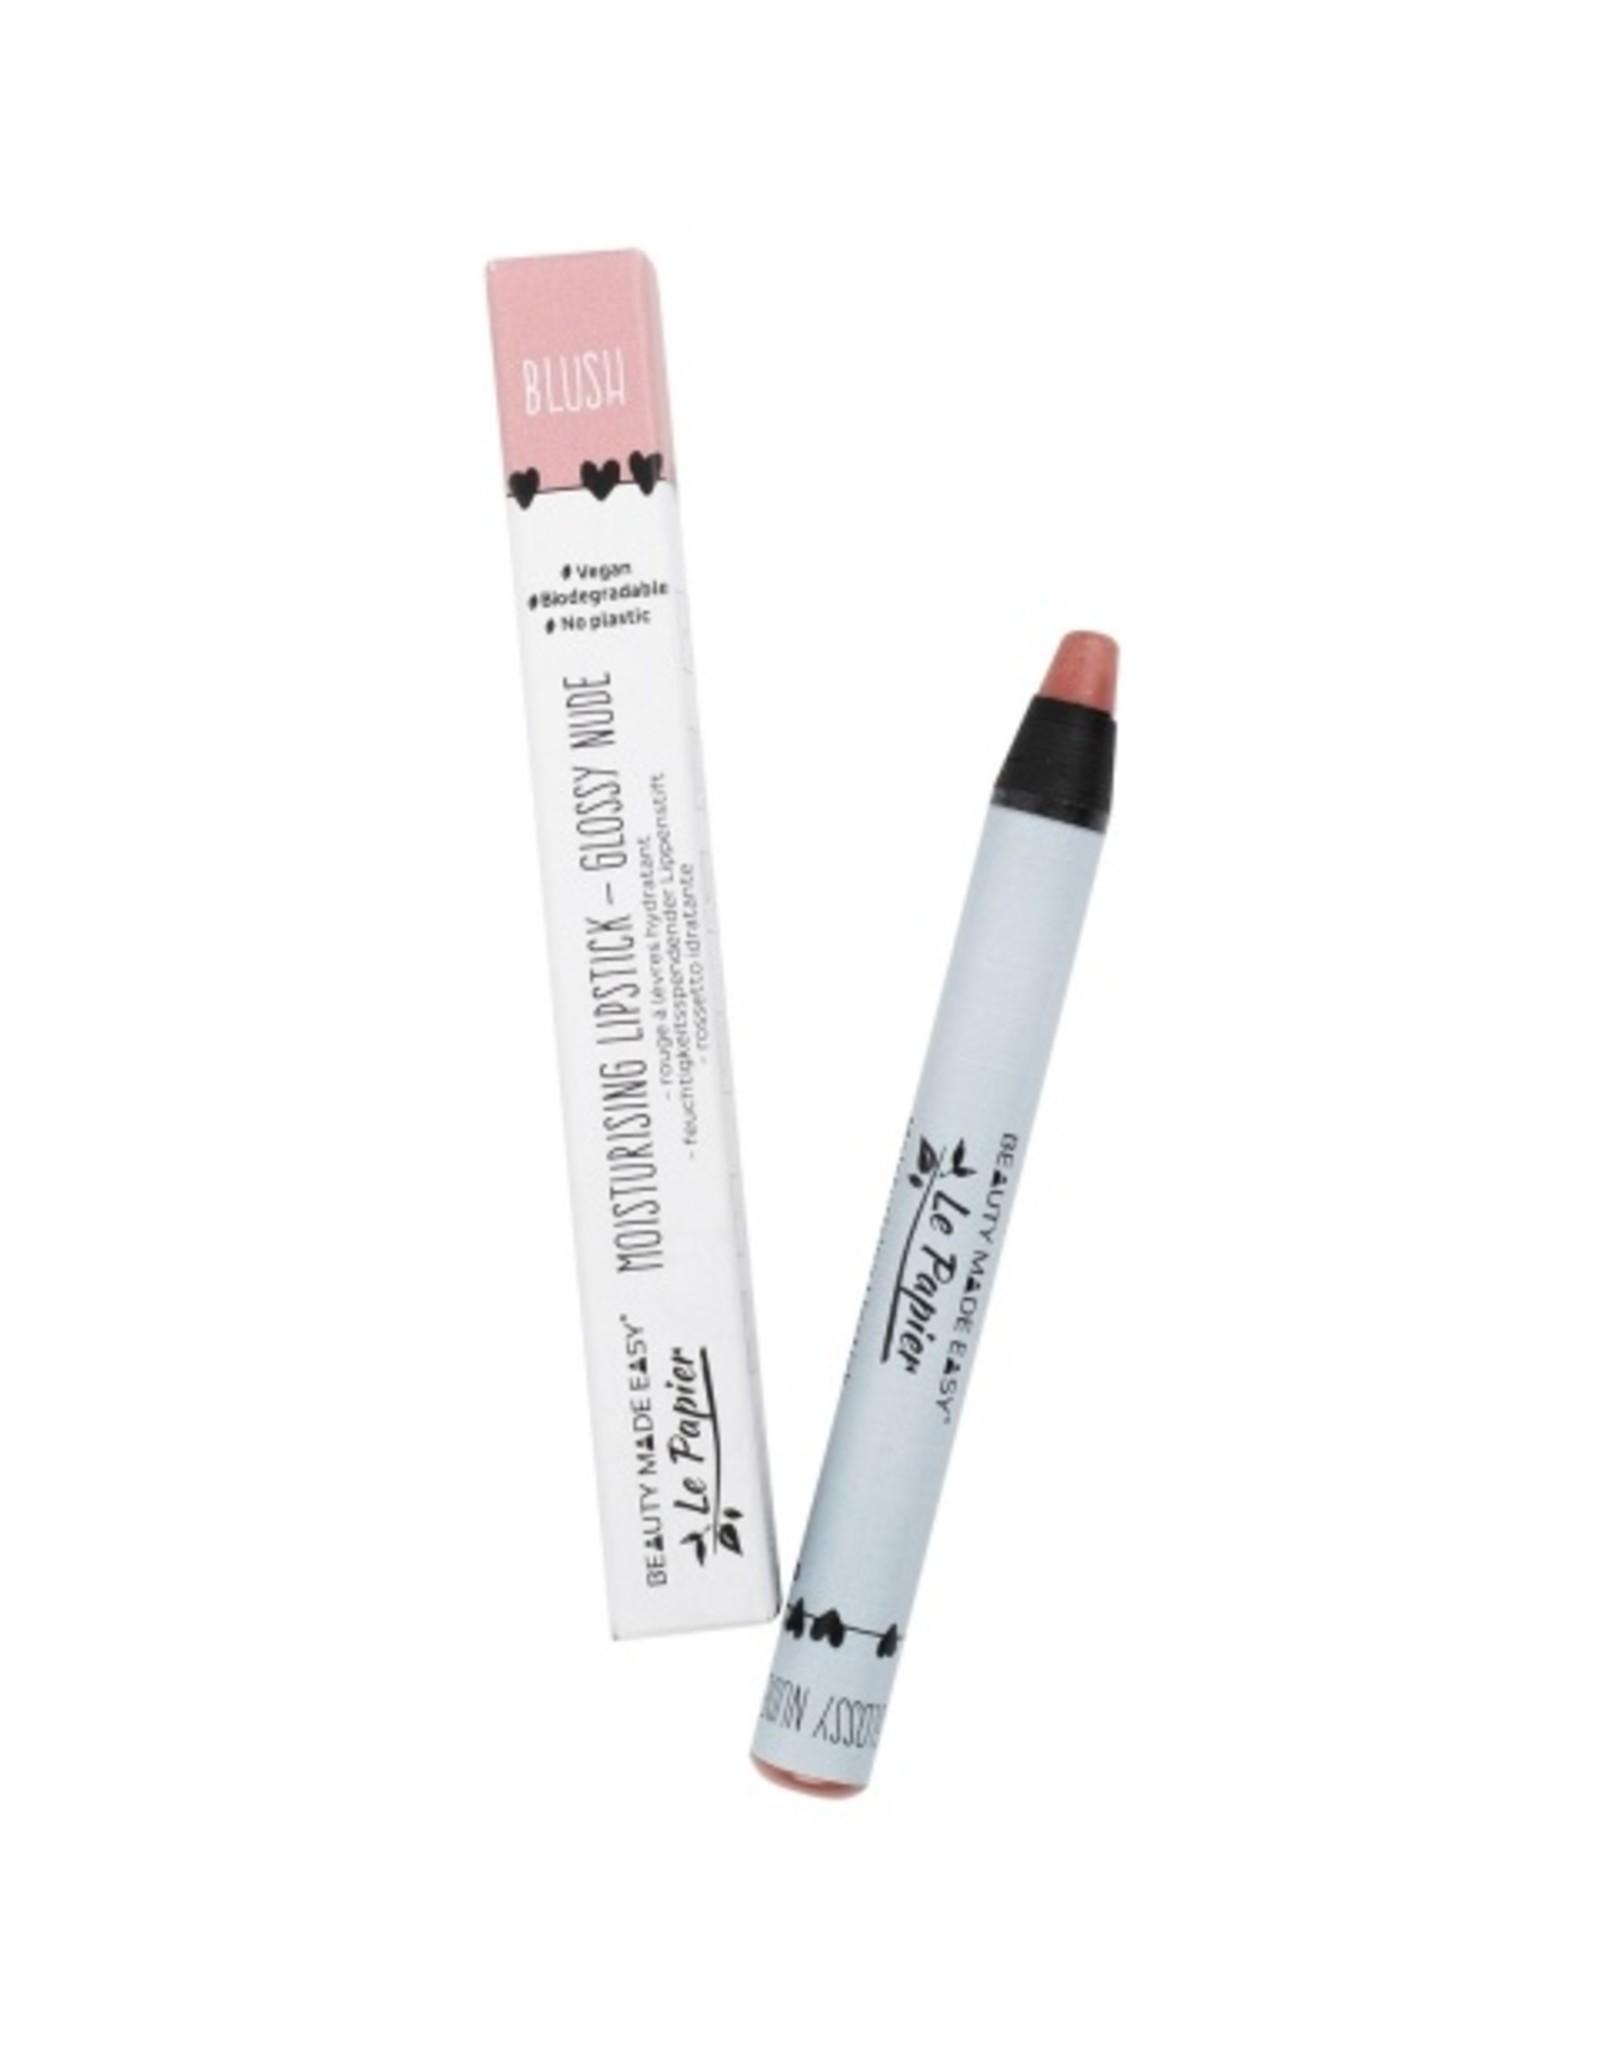 Le papier Moisturizing lipstick - Glossy Nudes - BLOSSOM - 6 g